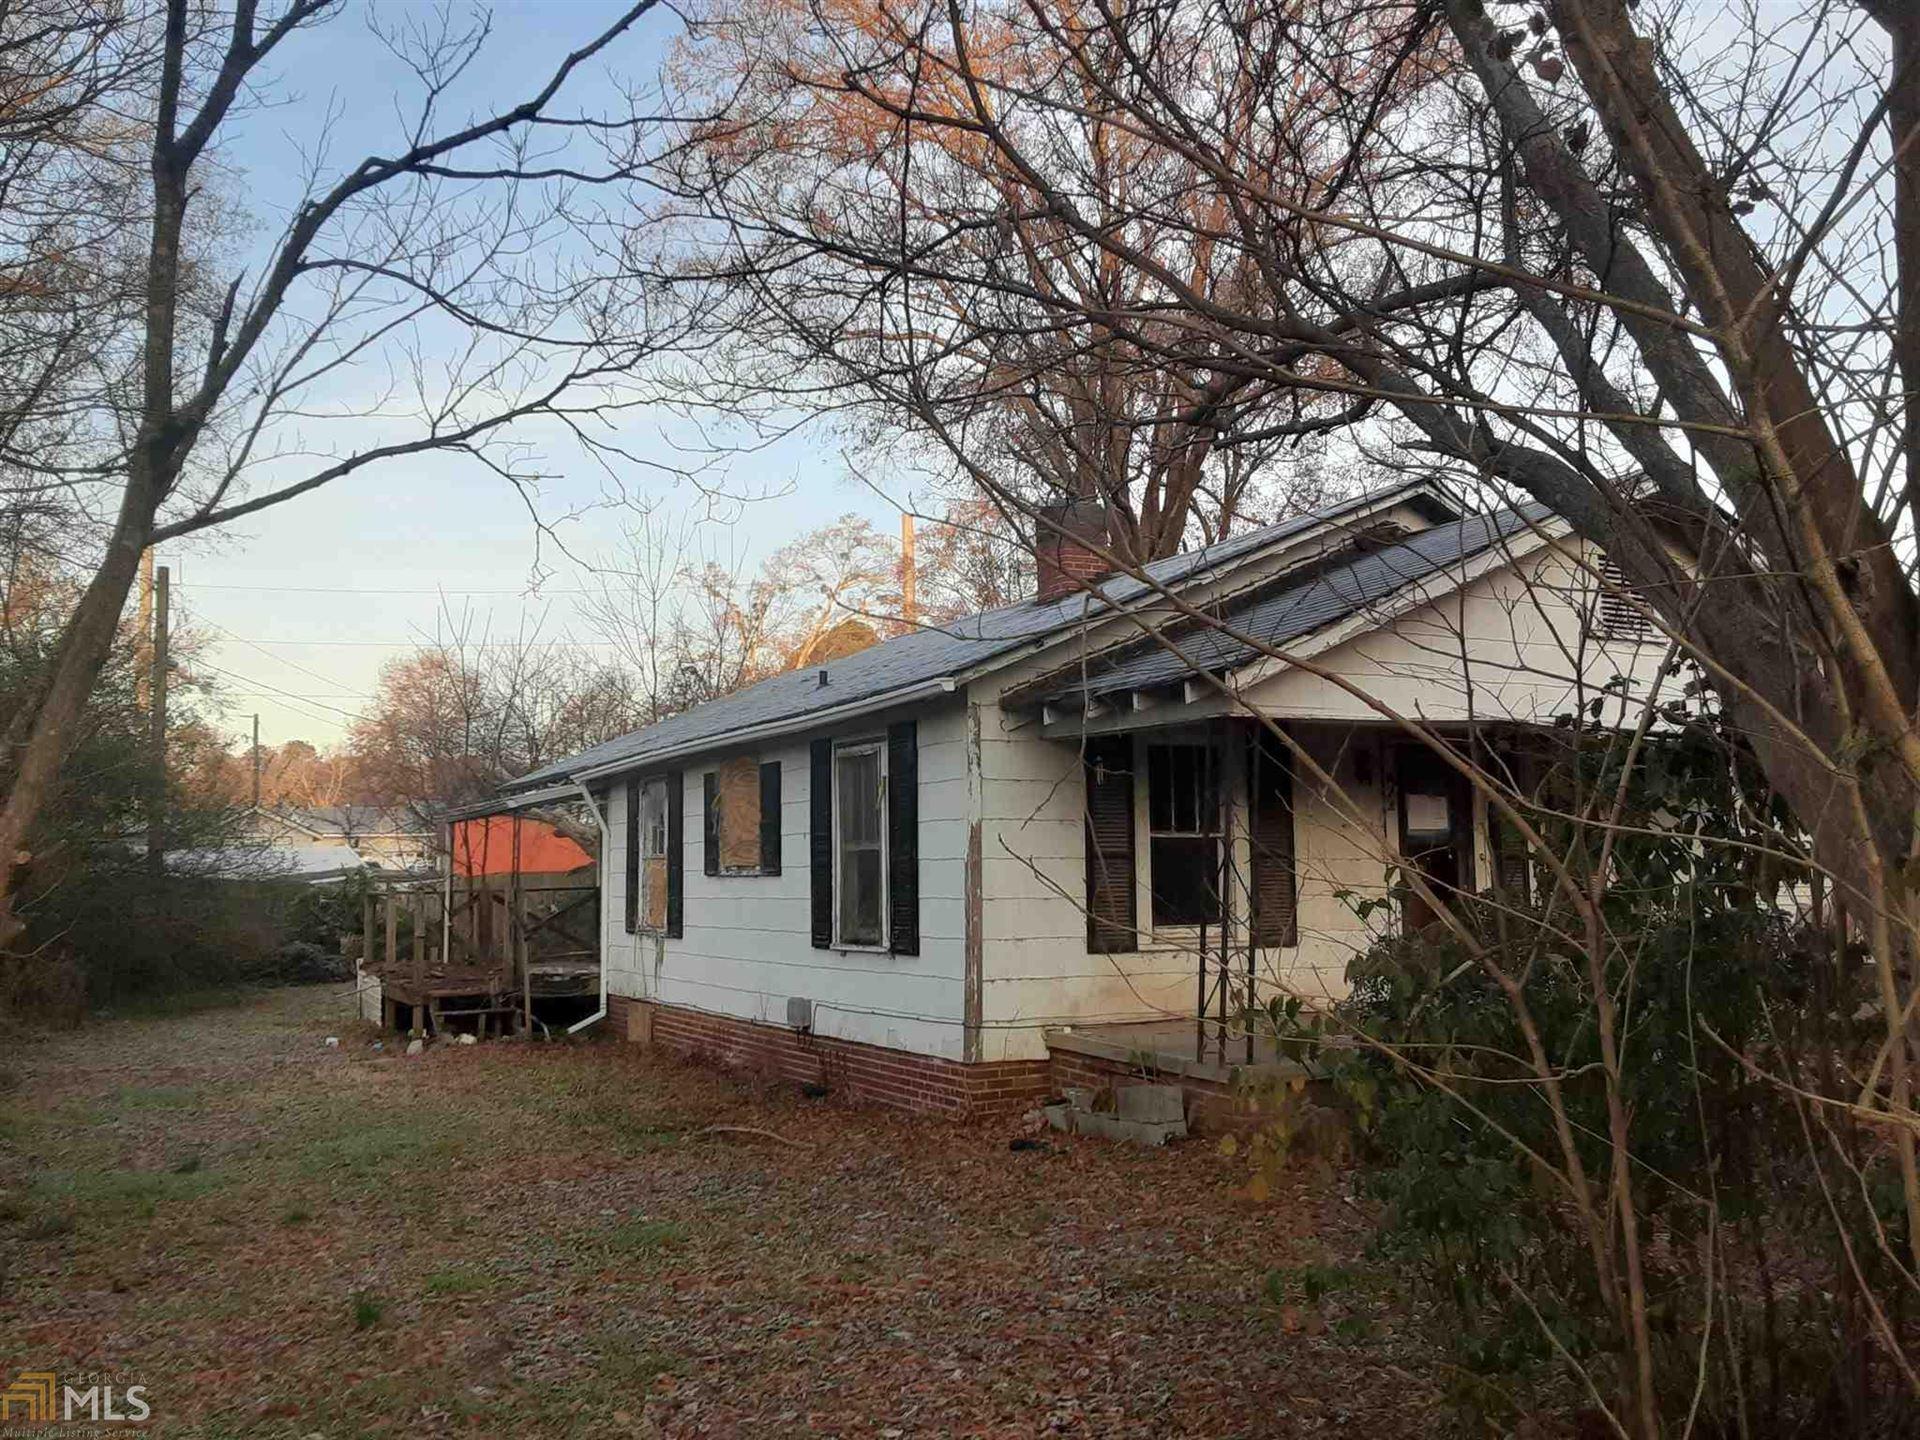 1110 Frances St, Cedartown, GA 30125 - #: 8906963